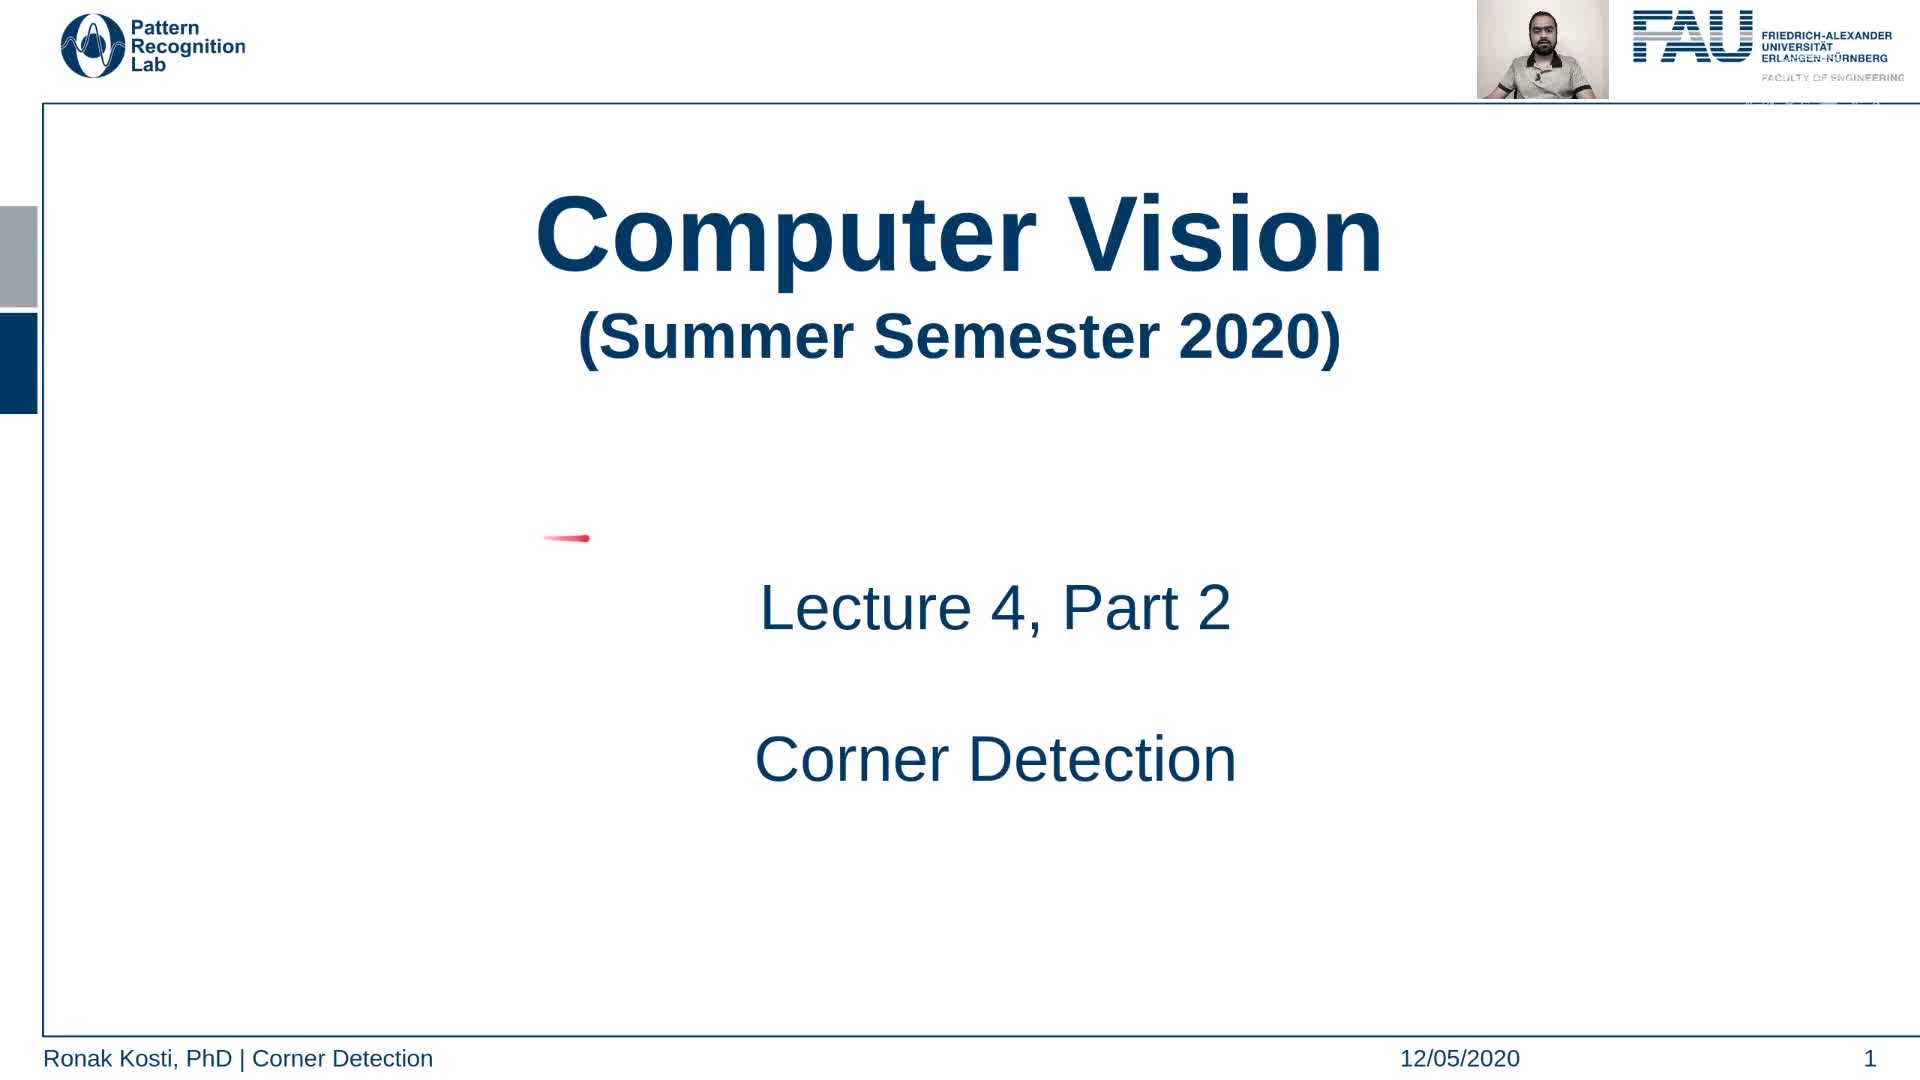 Corner Detection (Lecture 4, Part 2) preview image